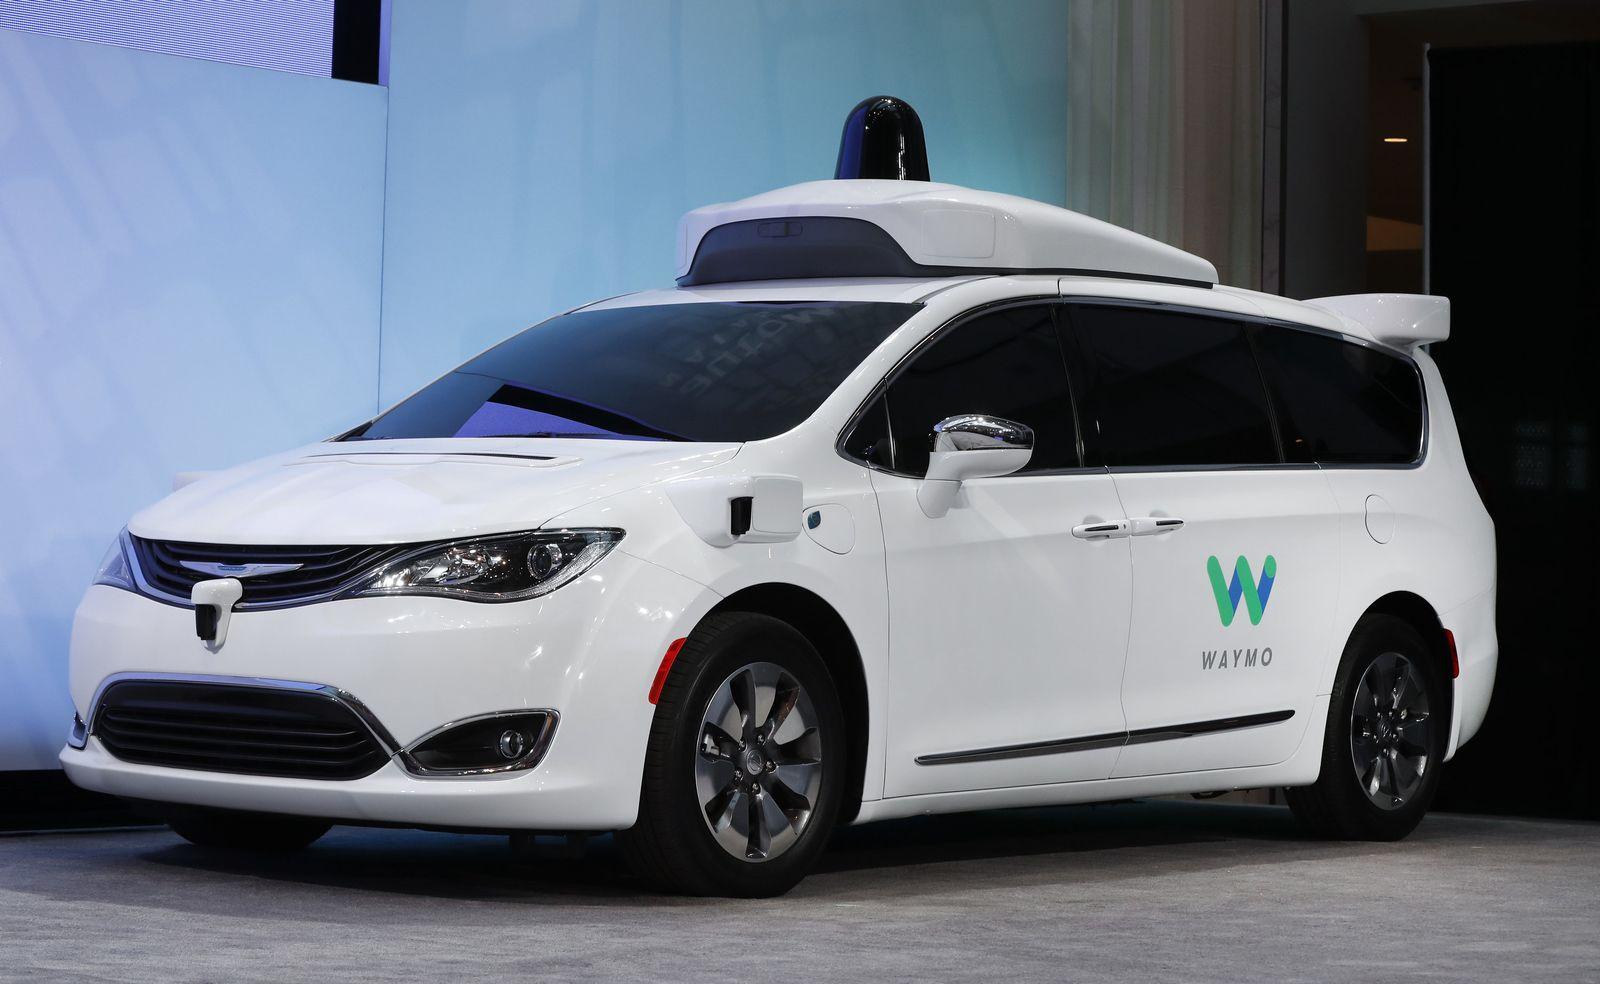 Waymo Chrysler Minivans